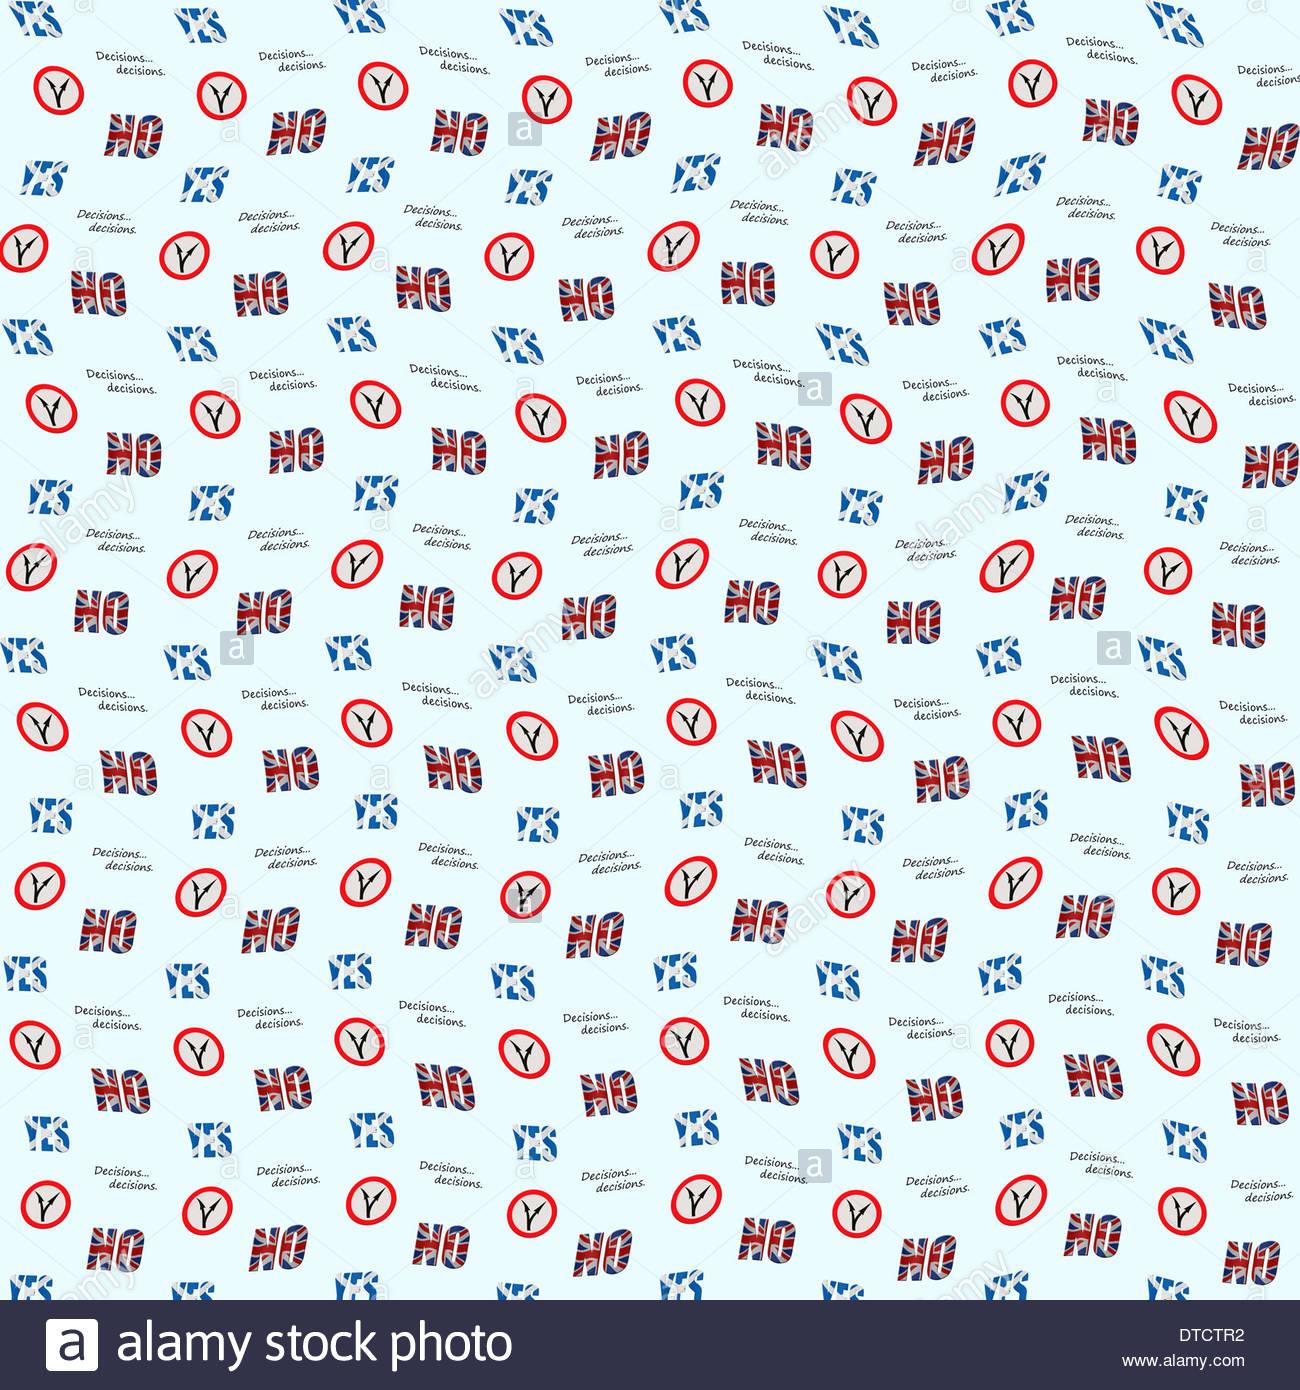 Digital Composition Concept - Decisions decisions wallpaper. Scottish independence referendum. - Stock Image